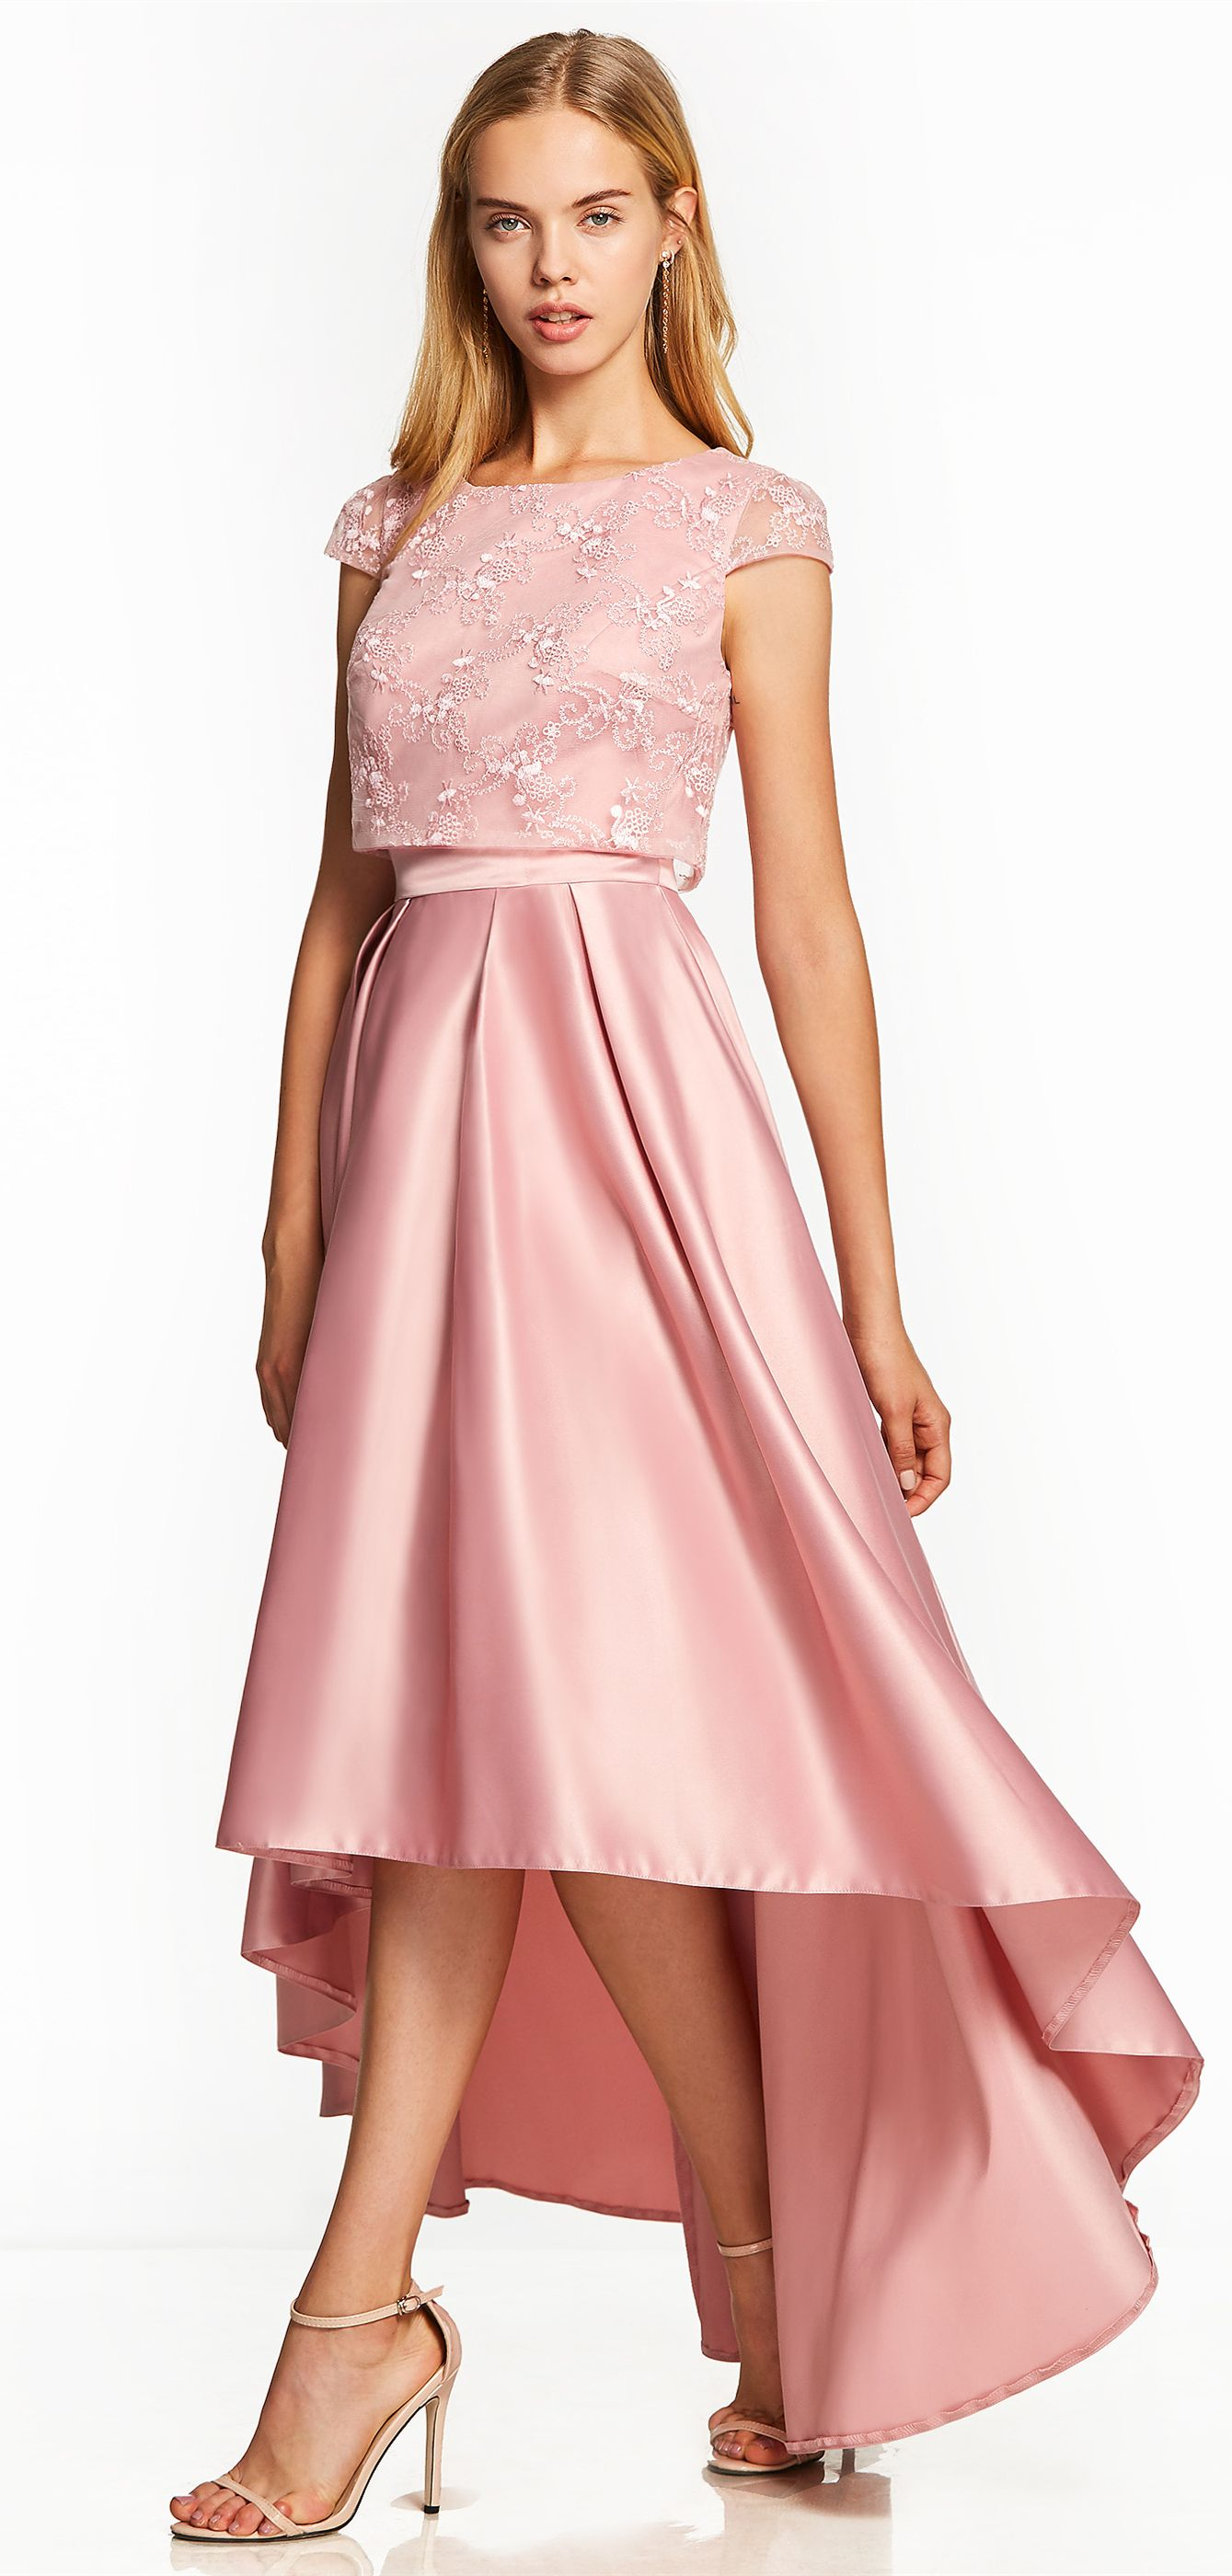 Scoop Neck Cap Sleeves Asymmetry Prom Dress